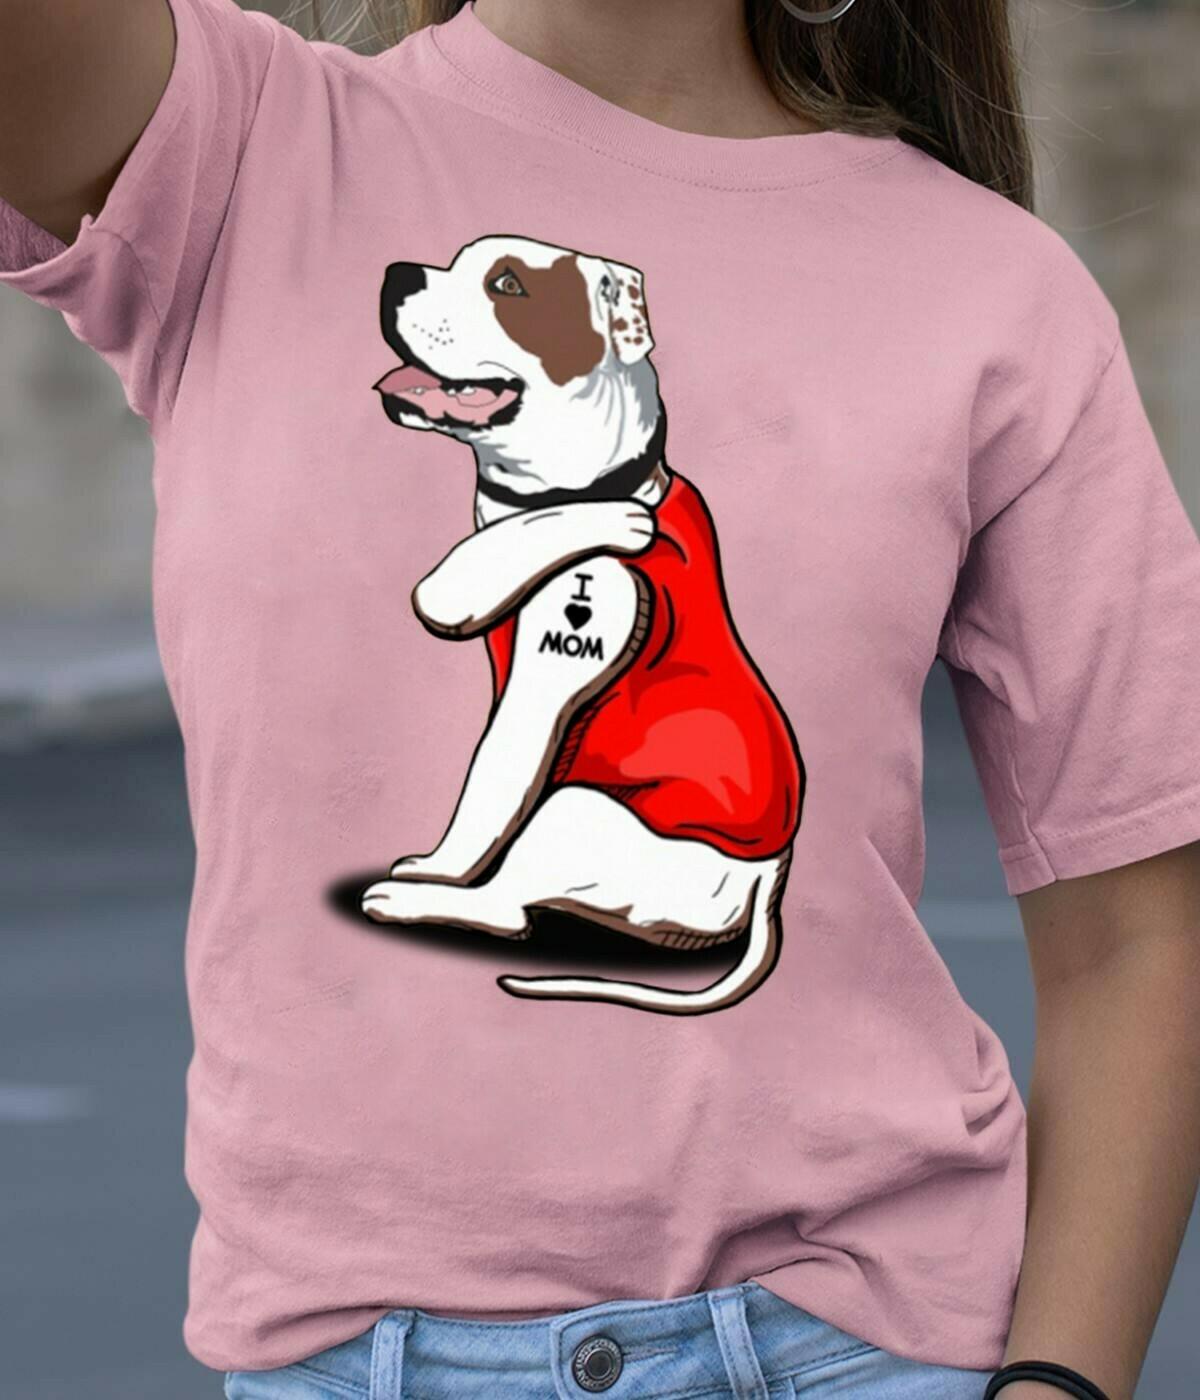 Bulldog Dog Tattoos I Love Mom Funny Shirt T-Shirt Hoodie Sweatshirt Sweater Tee Kids Youth Gifts Jolly Family Gifts